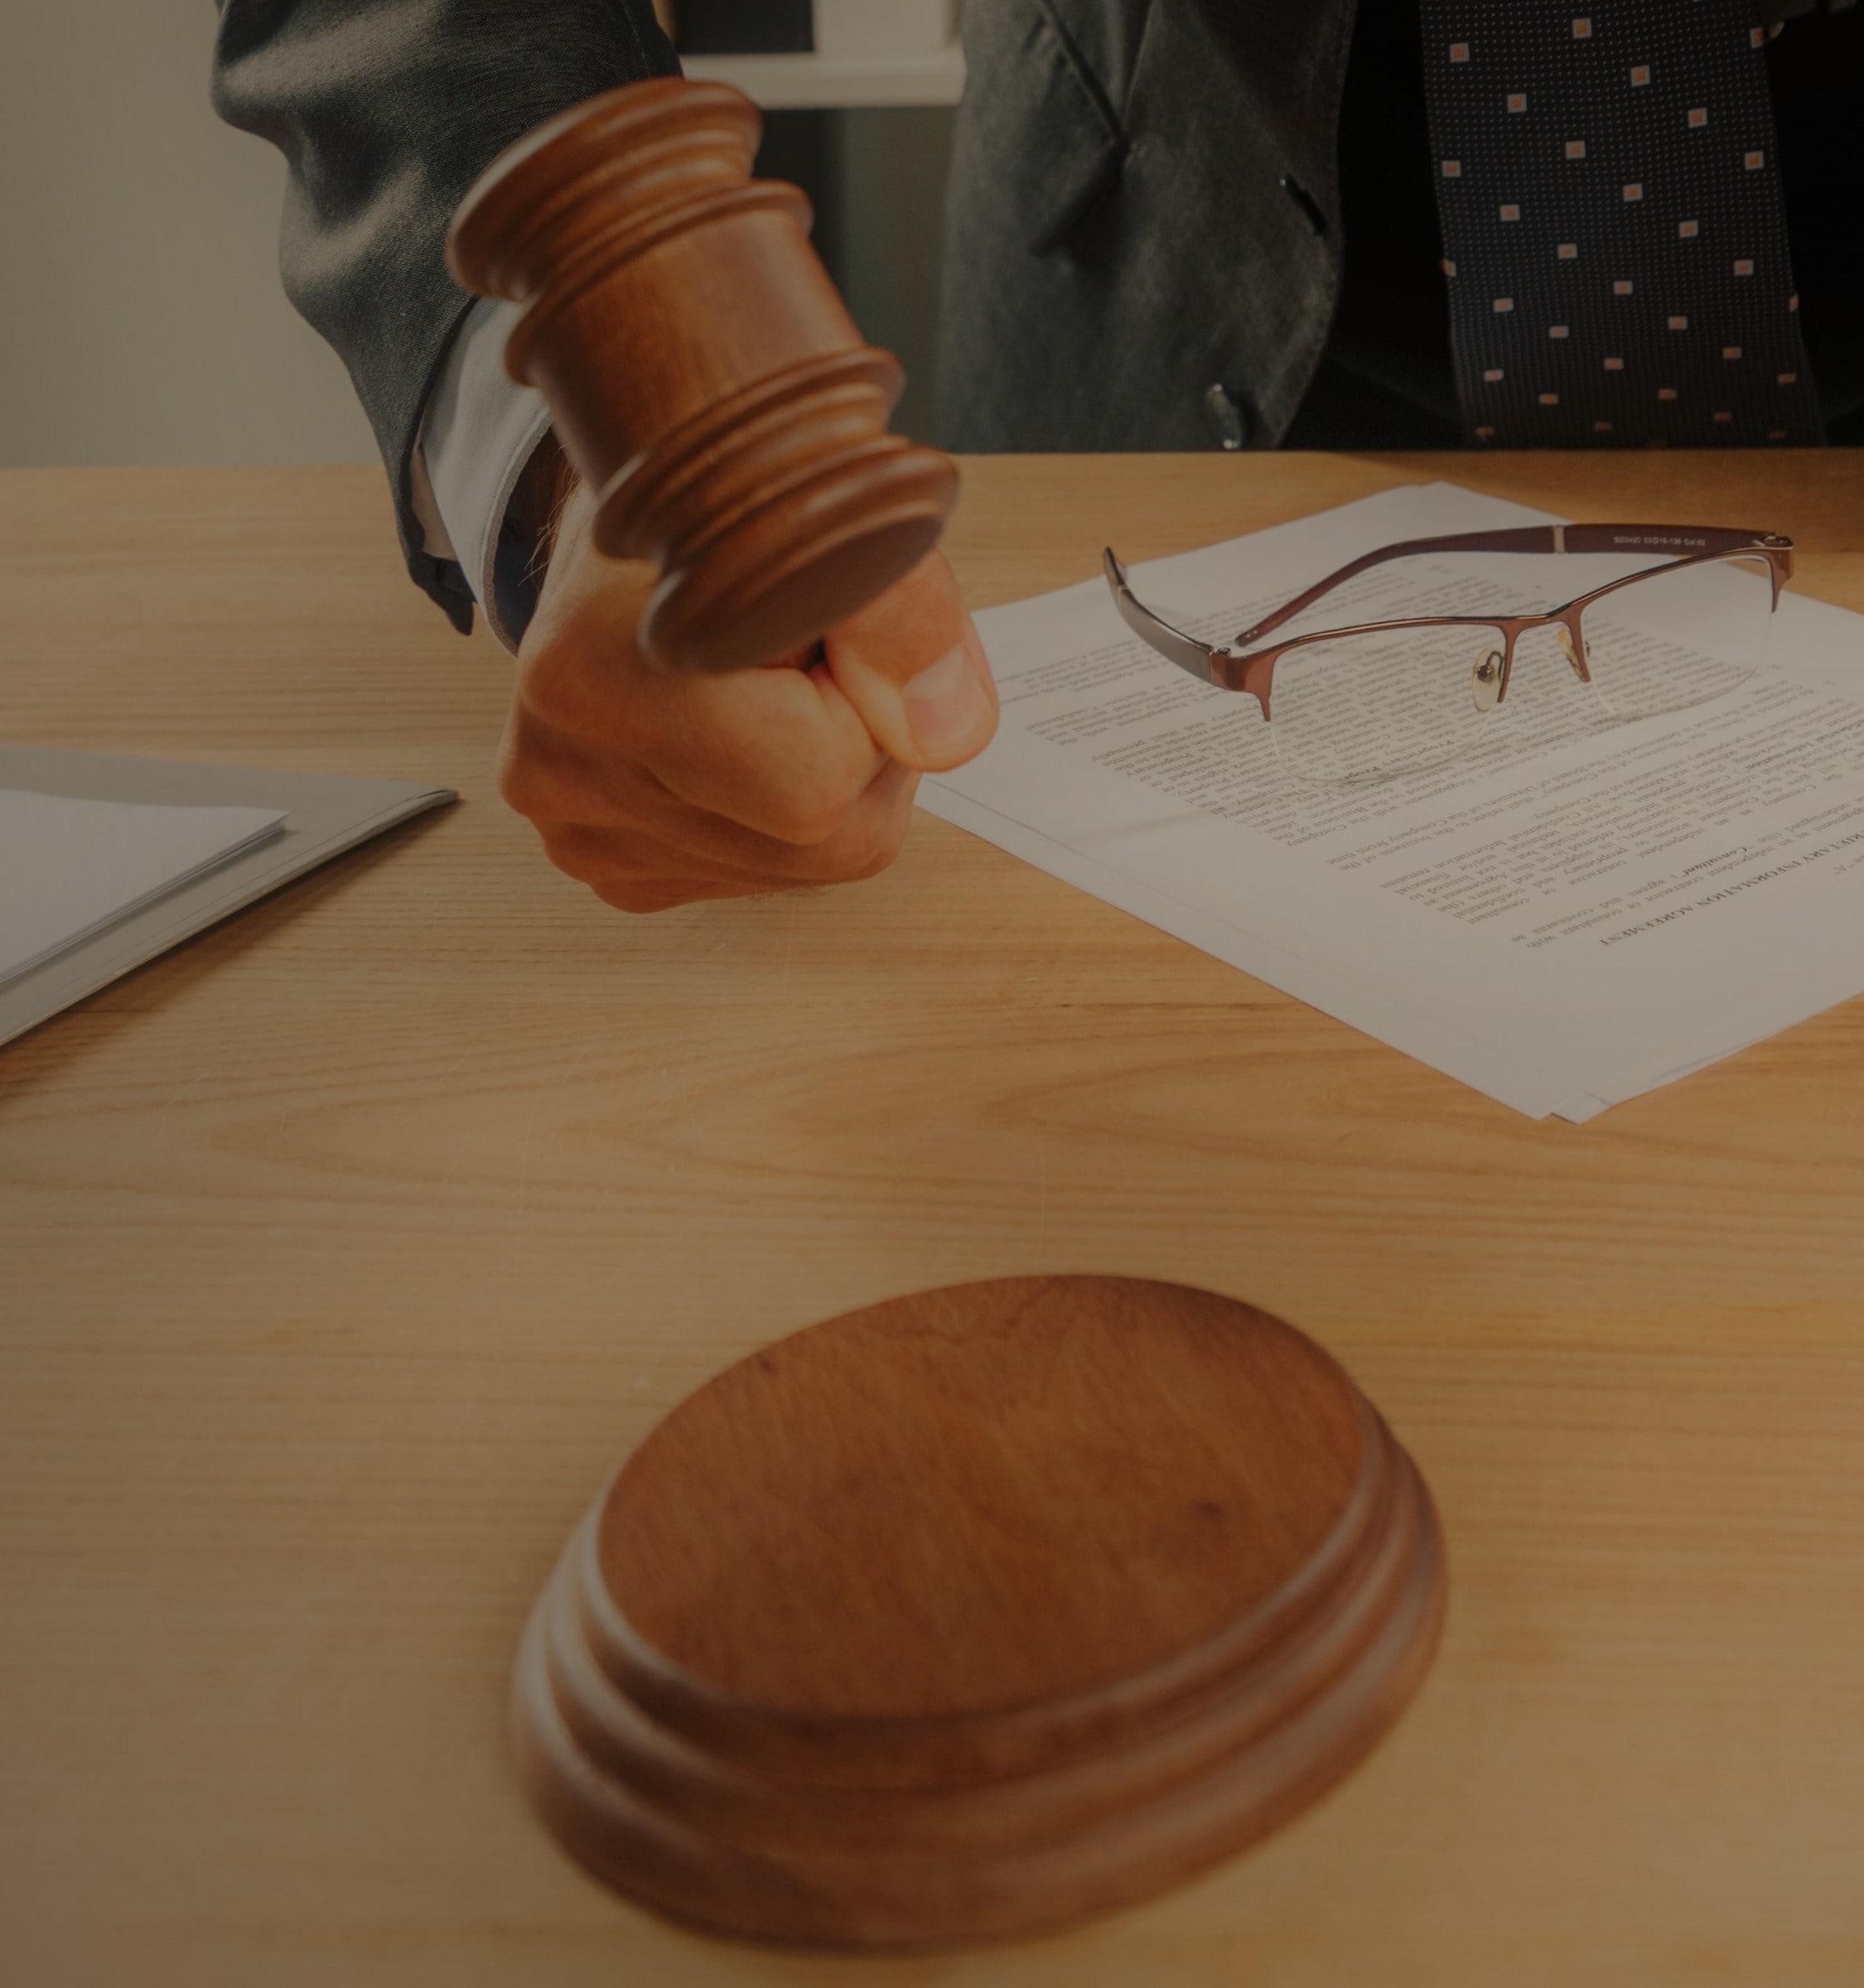 mazo-juez-min.jpg